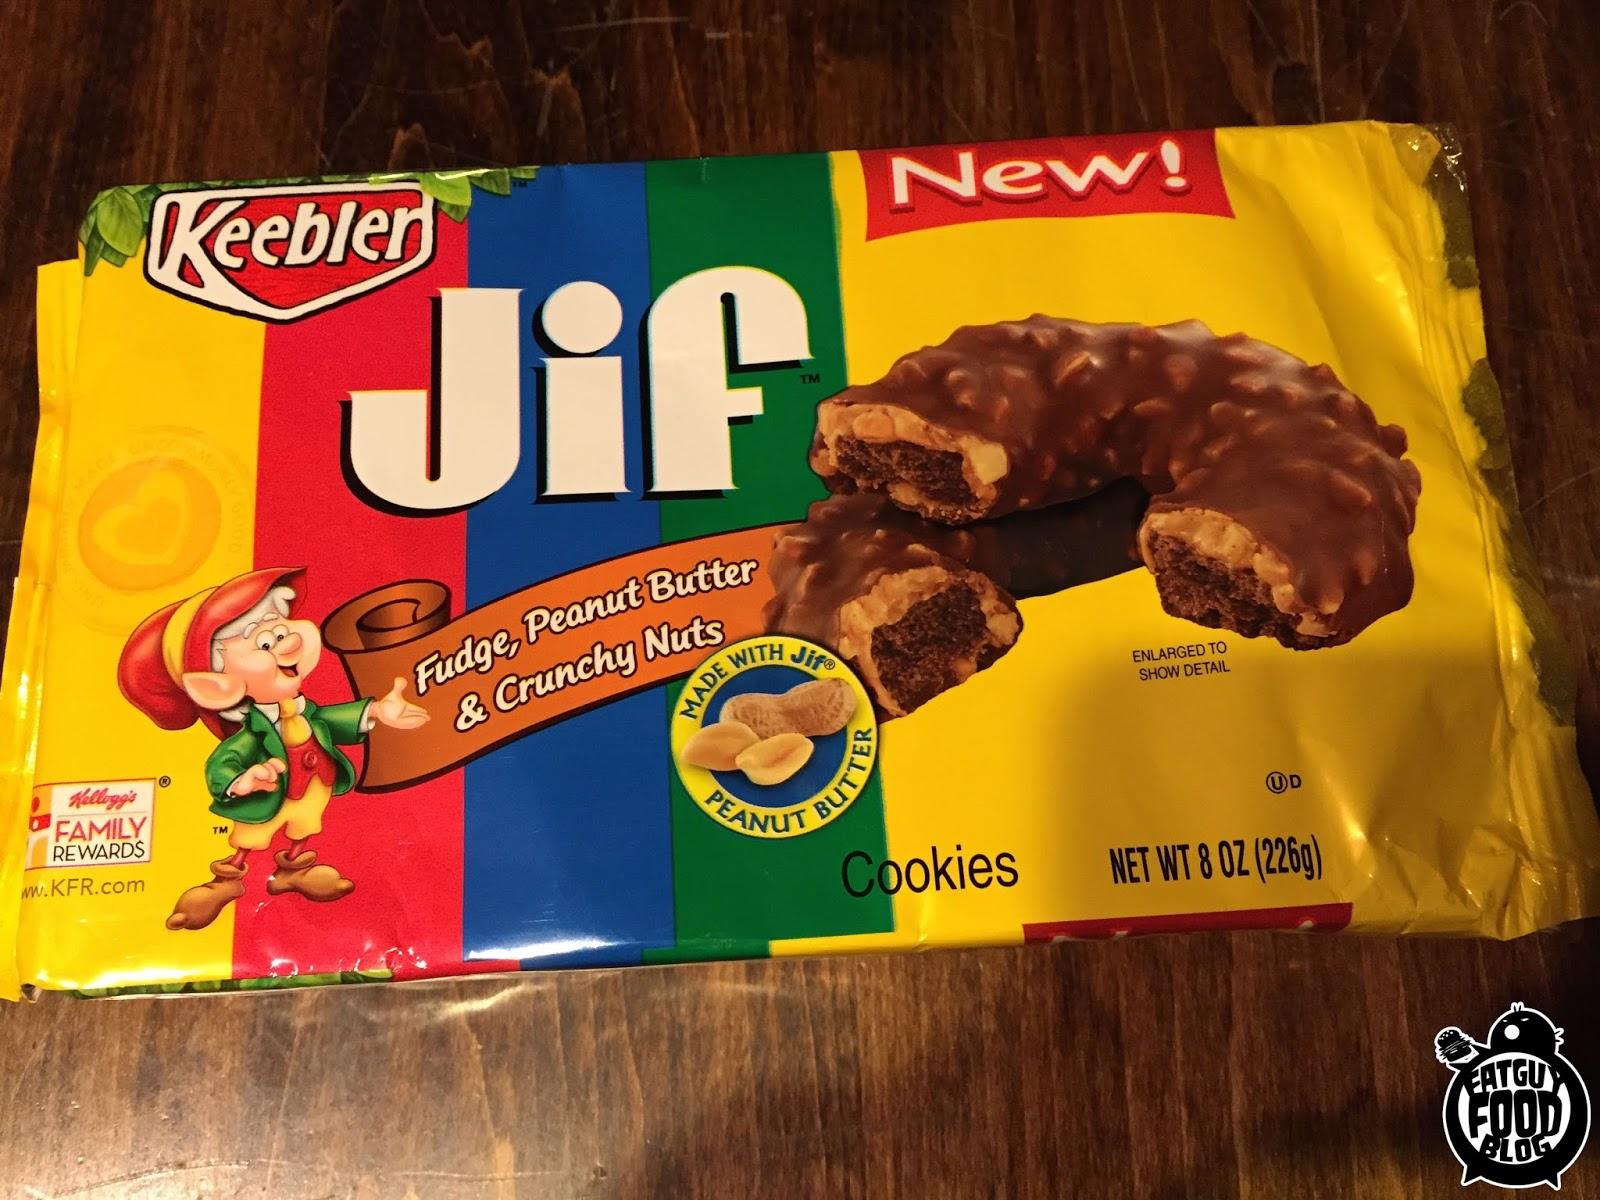 Fatguyfoodblog Keebler Jif Peanut Butter Cookies